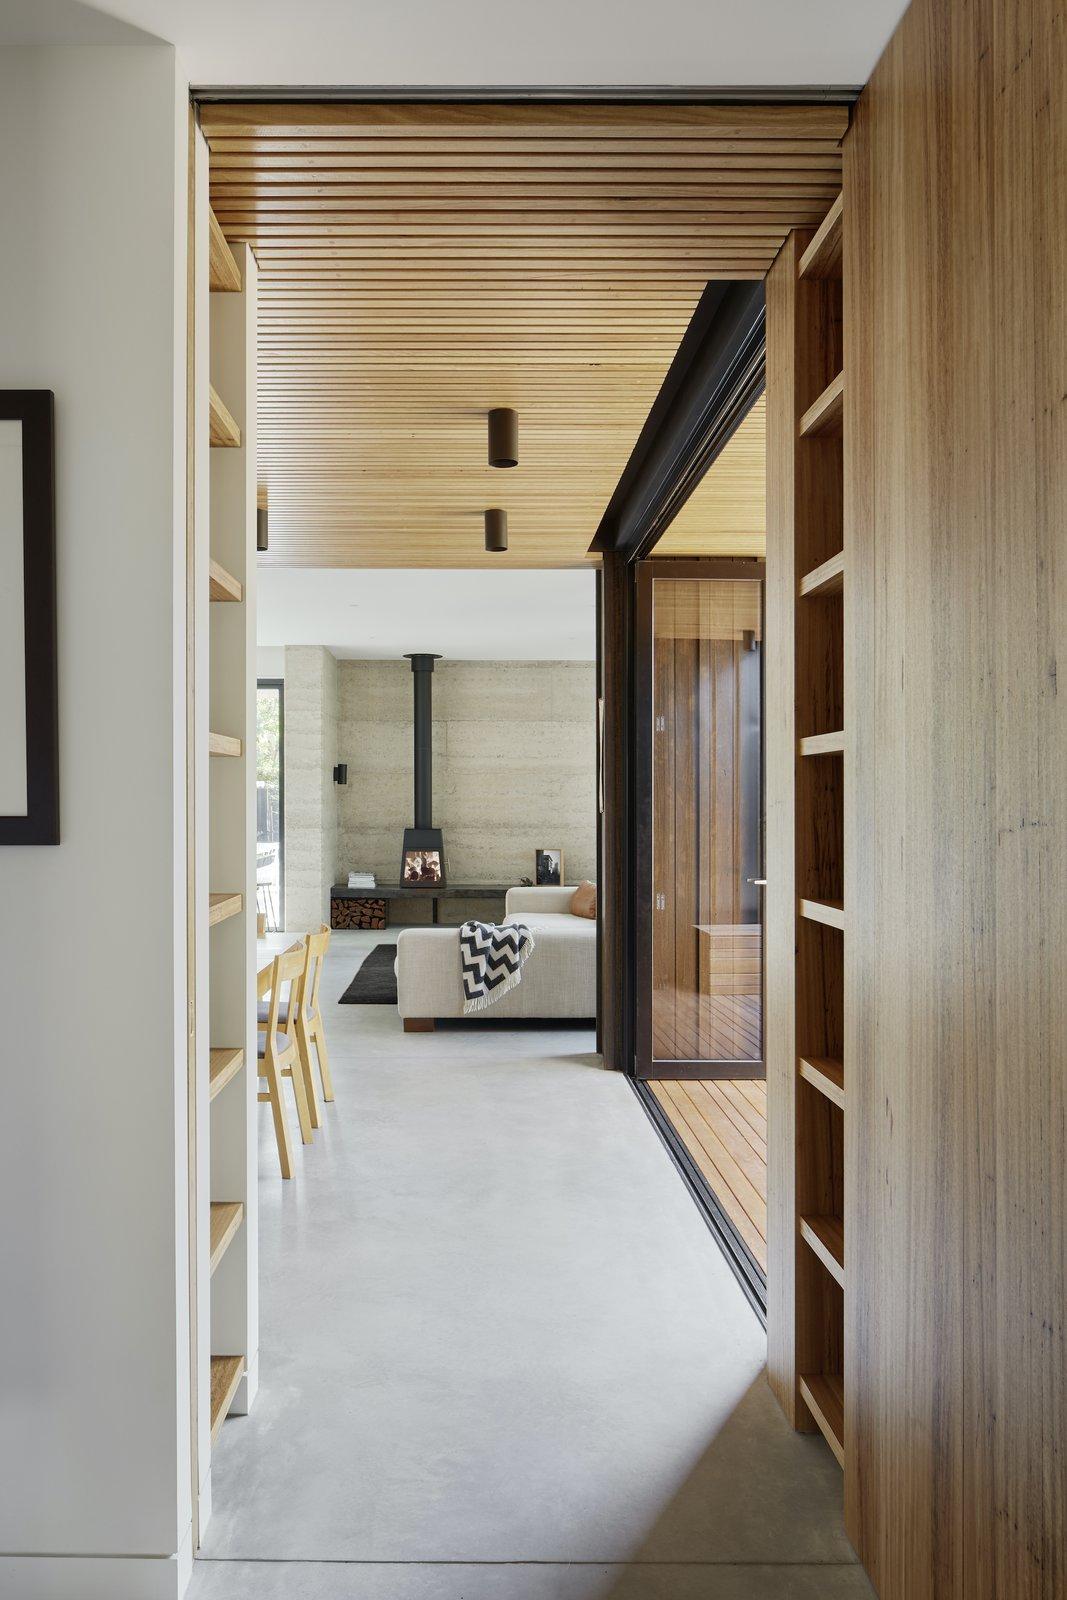 Hallway and storage of Laurel Grove by Kirsten Johnstone Architecture.